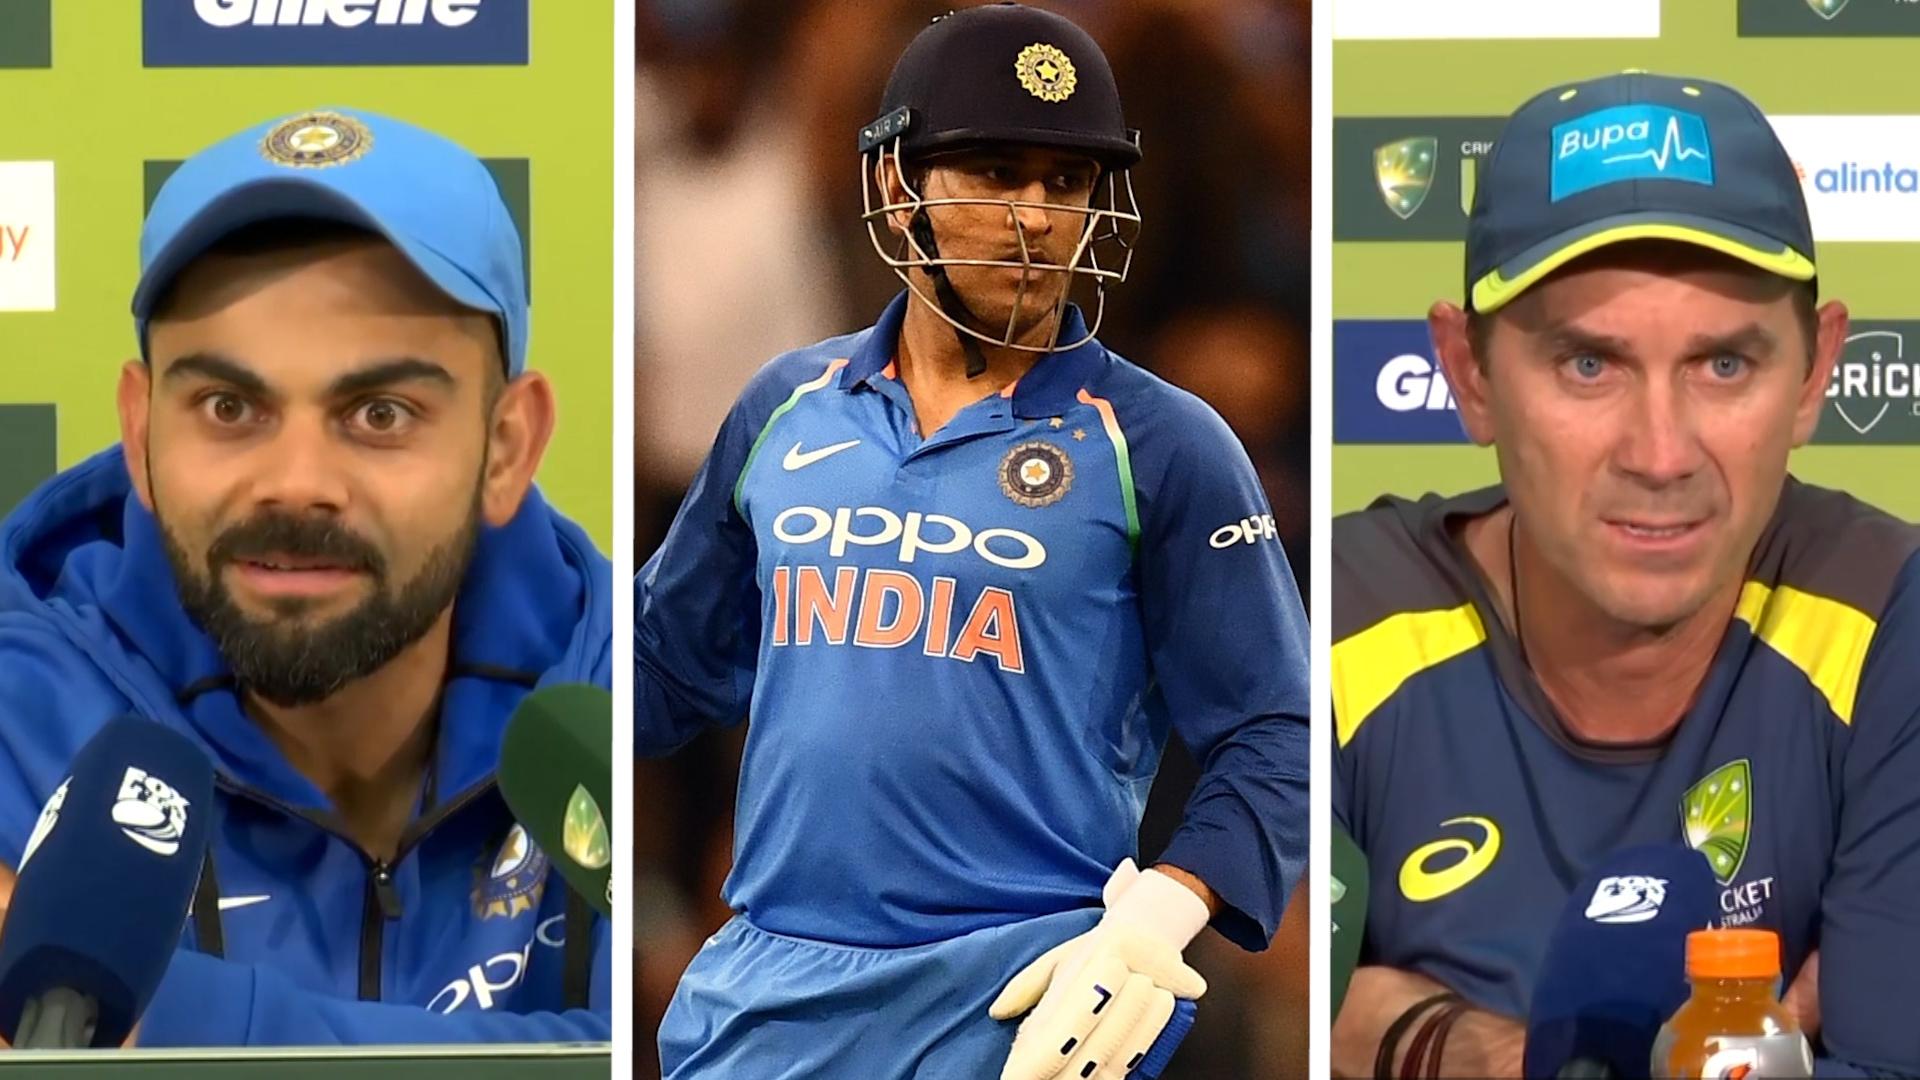 Cricket Video - Australia vs India 3rd ODI 2019 Match Highlights